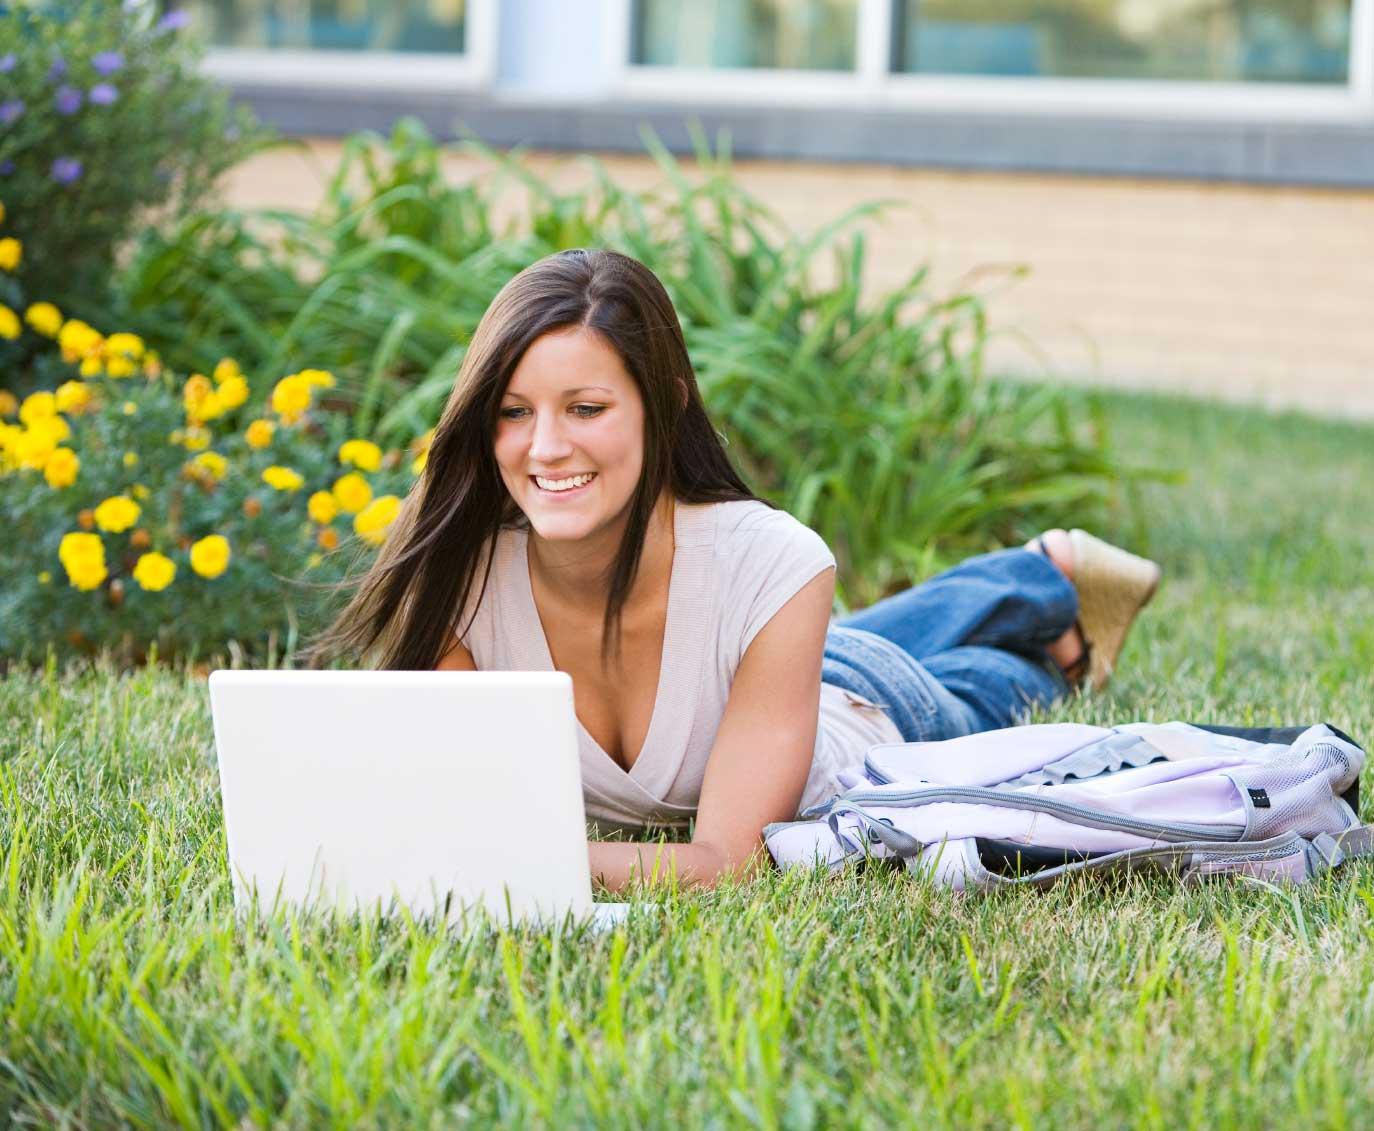 Establish a Positive Online Presence